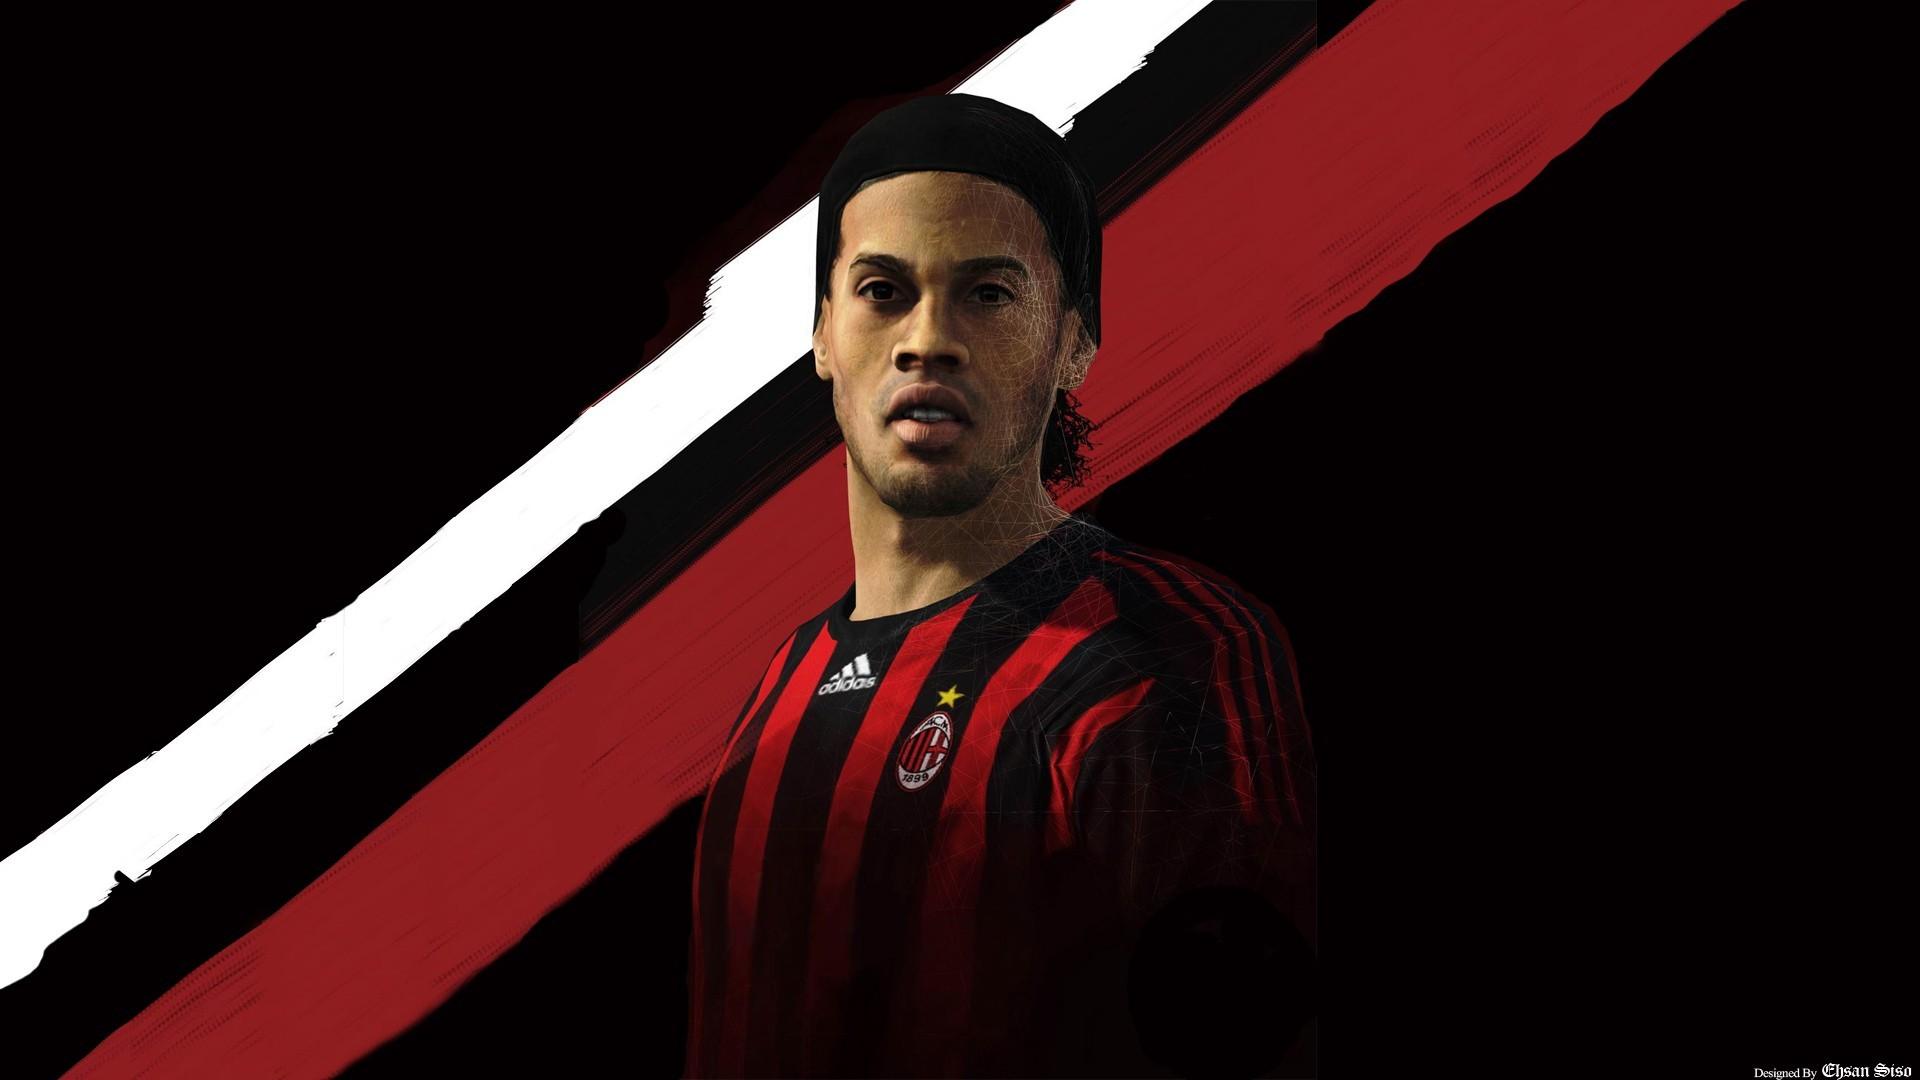 General 1920x1080 Ronaldinho AC Milan artwork men soccer sport  sports